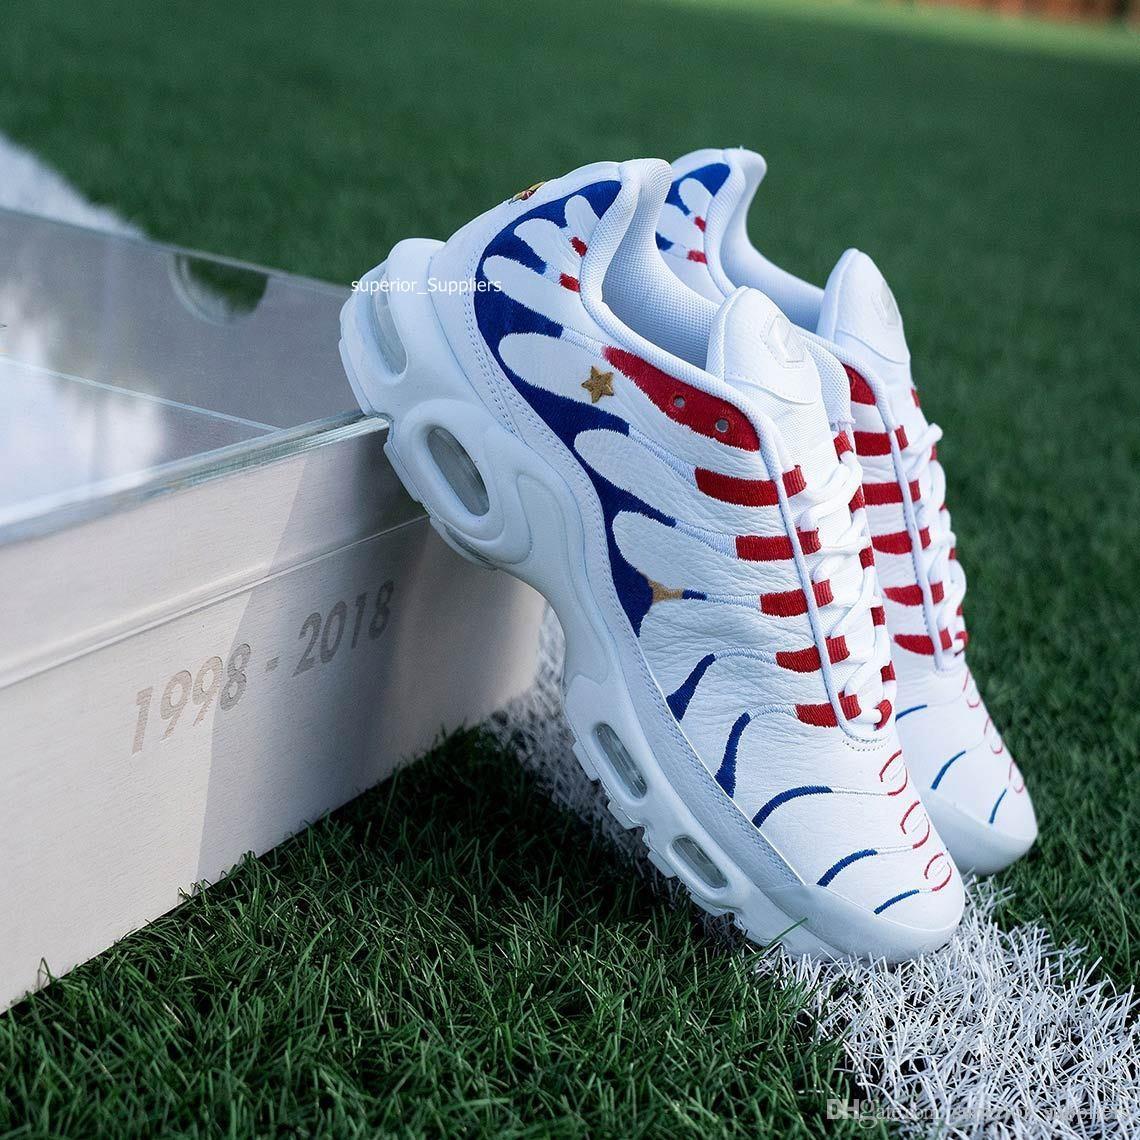 online store 382cc 5447d Acheter Nike Air Max TN Nouveau 2018 Marque Sport Hommes Chaussures New Air  Coussin TN Pour Hommes Noir Blanc Rouge Hommes Runner Sneakers Homme  Trainers ...